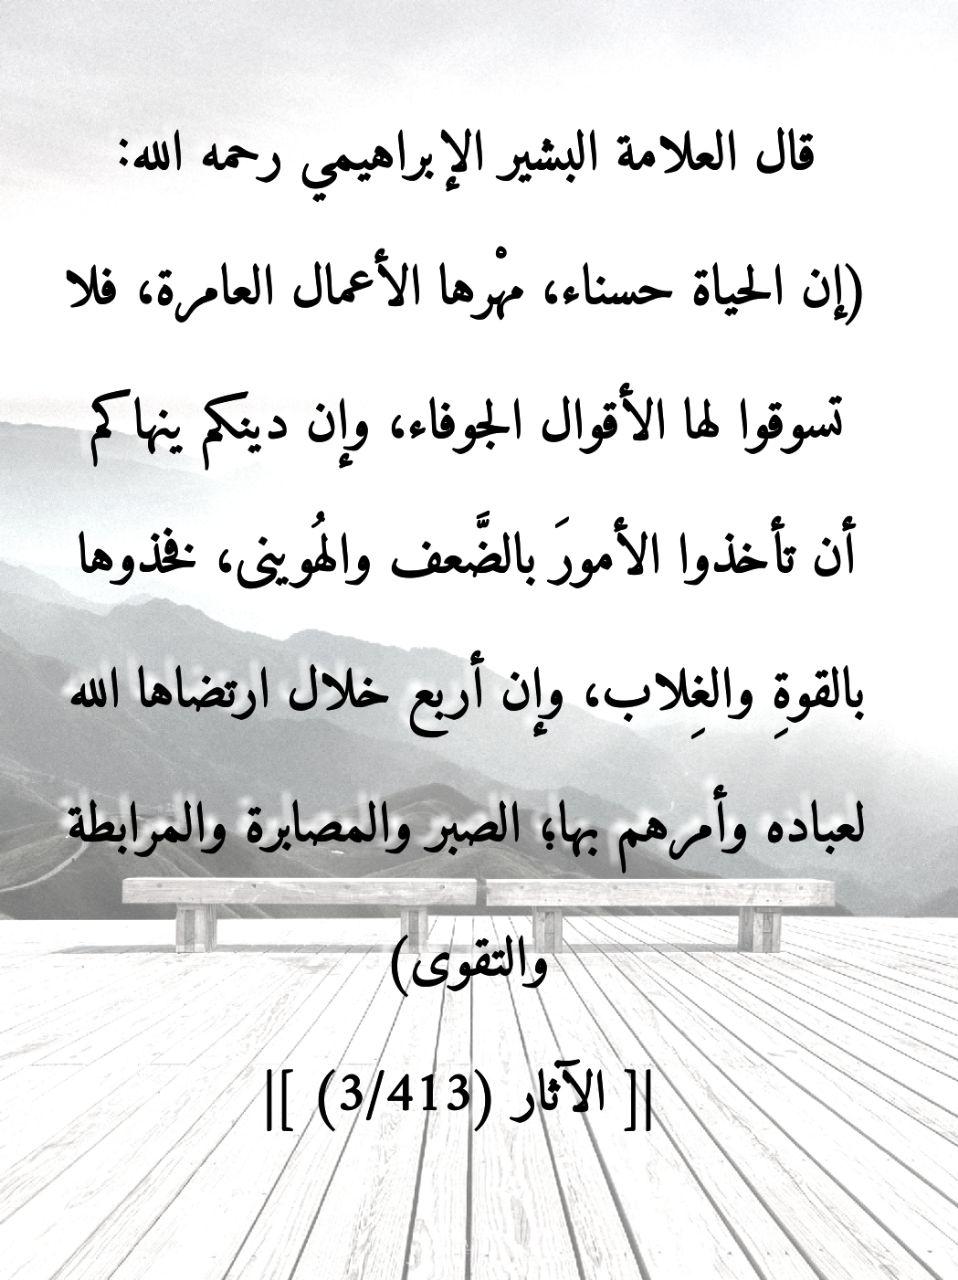 IMG_20210907_173758_677.jpg